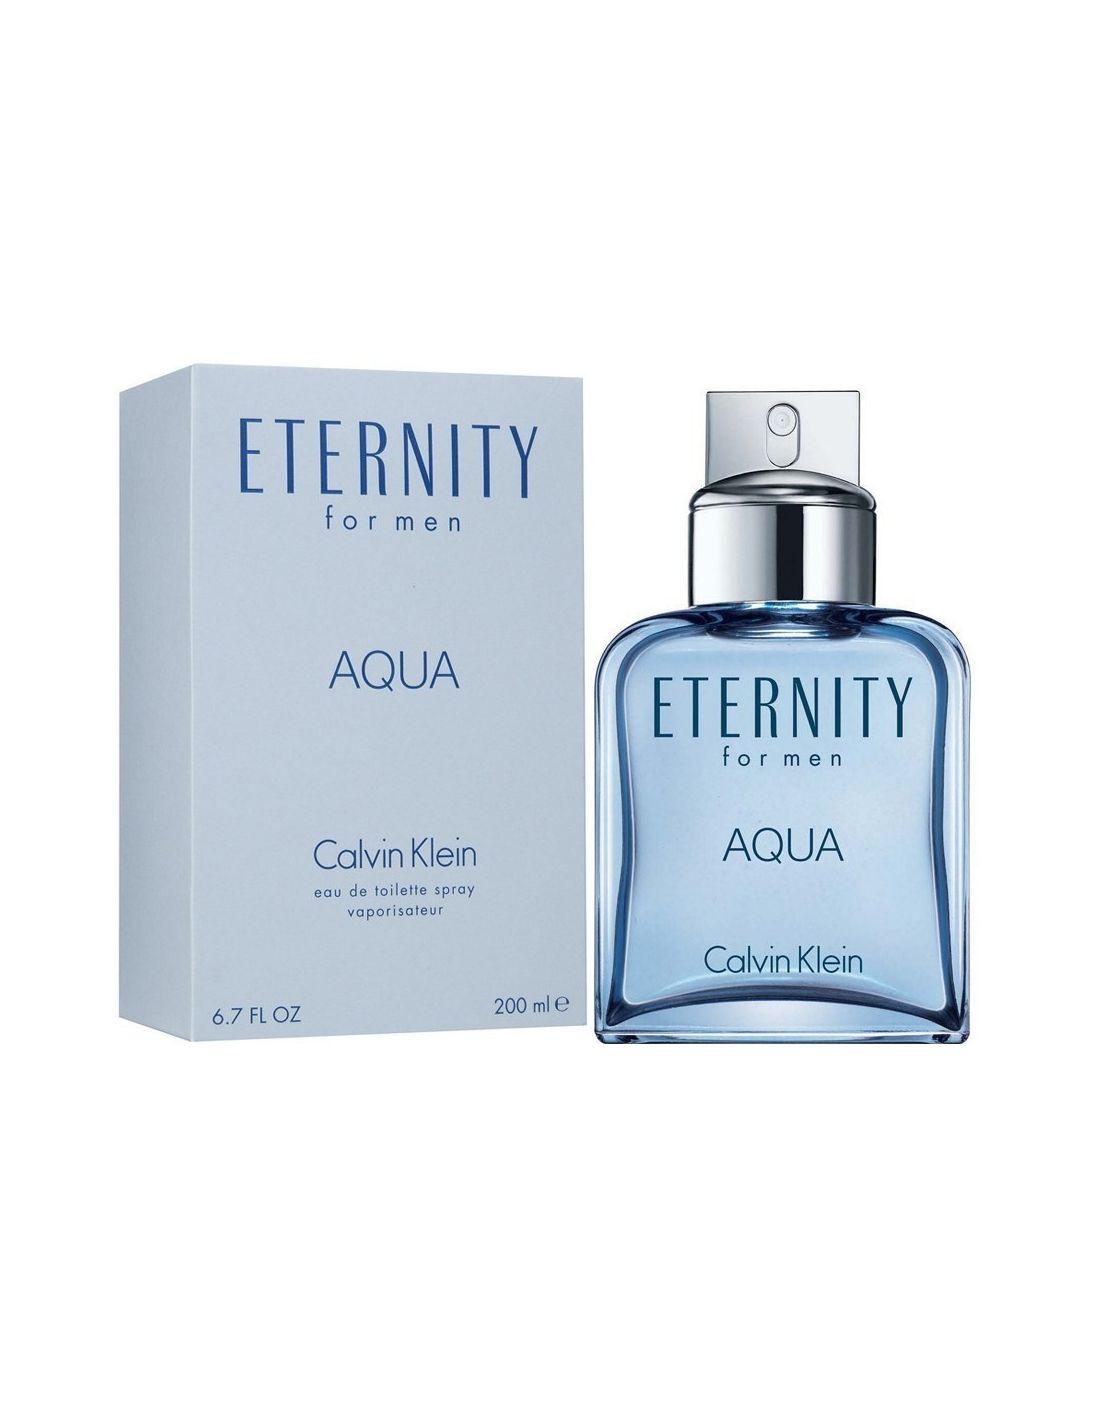 Eternity Aqua Men Eau de Toilette 200 ml Perfumes 24   Perfumaria Online bf00e531c0